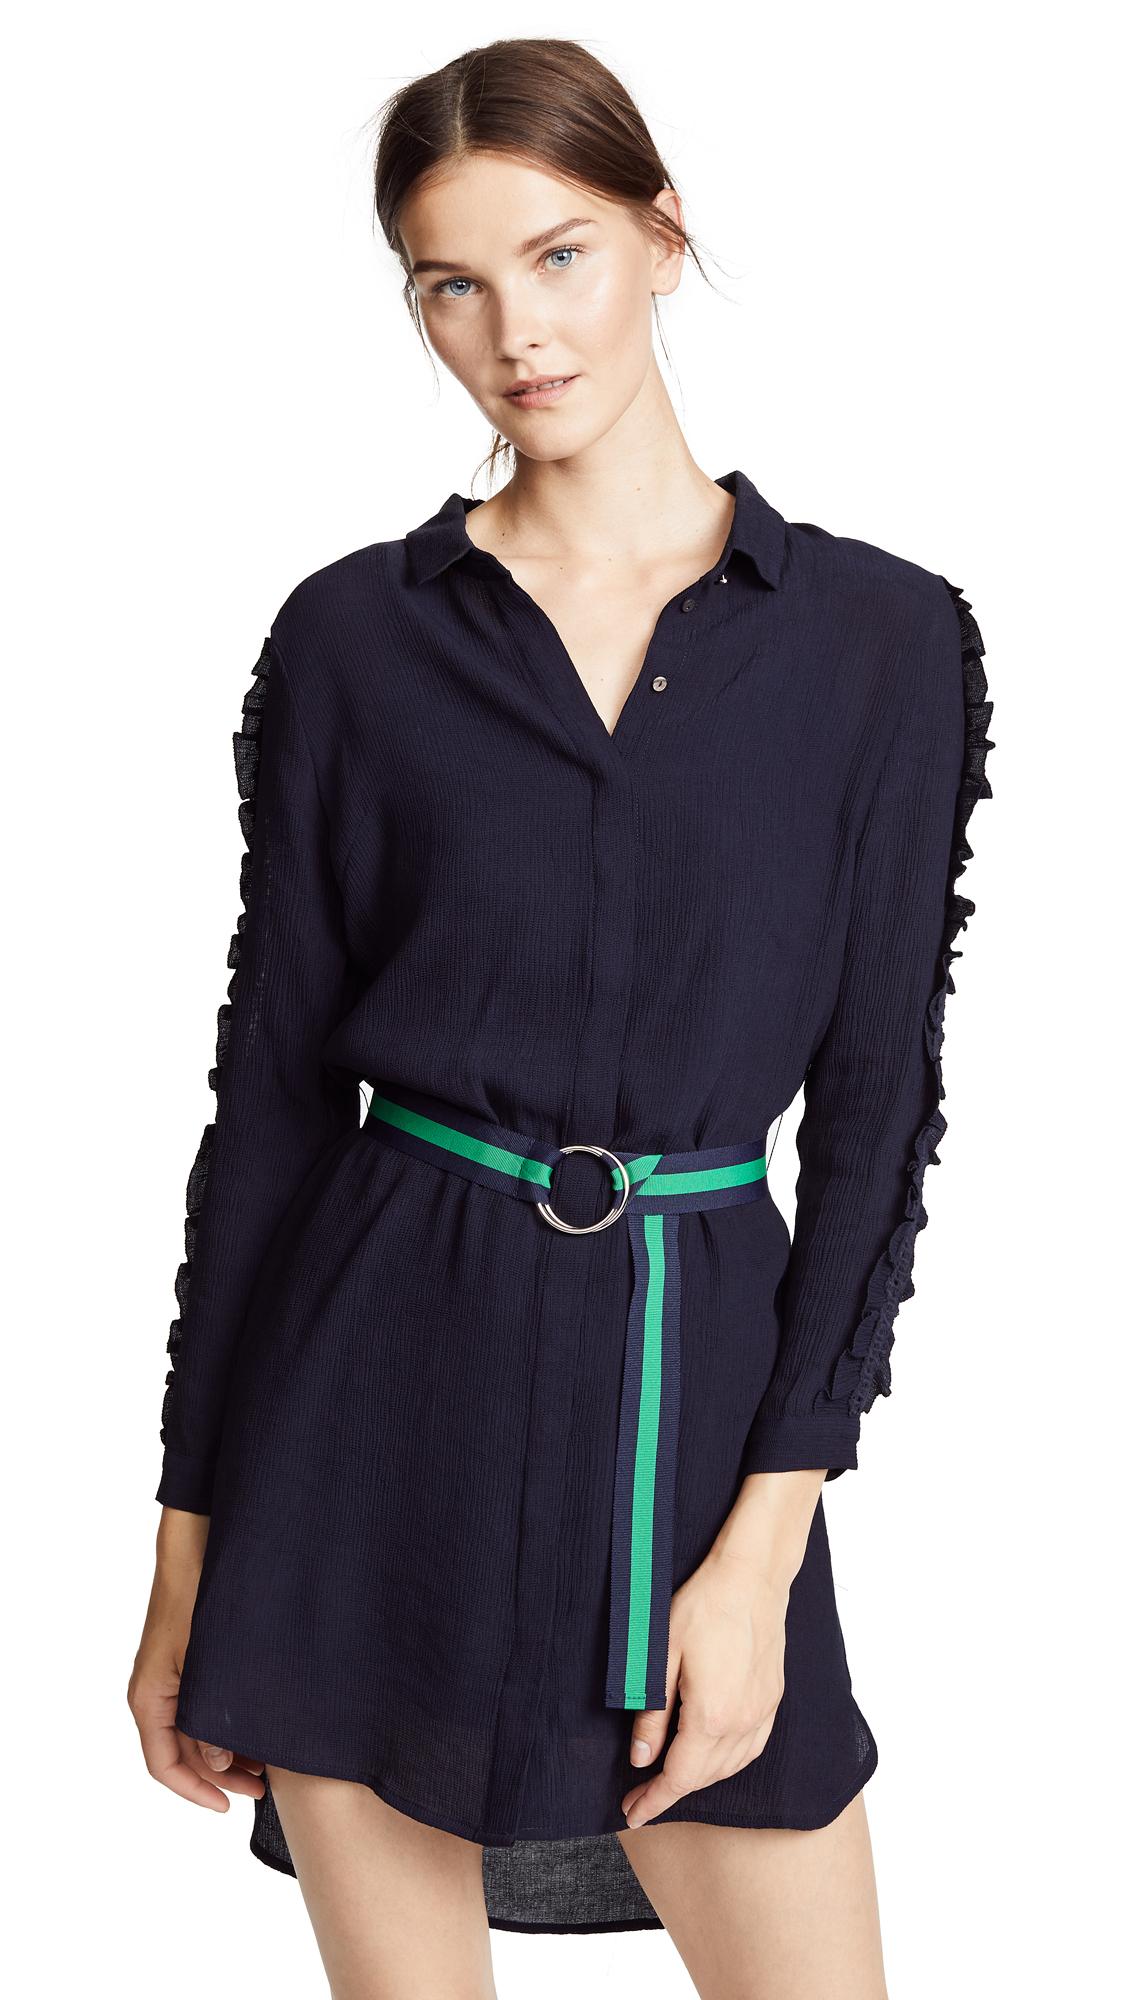 SUNCOO Cora Dress in Bleu Nuit